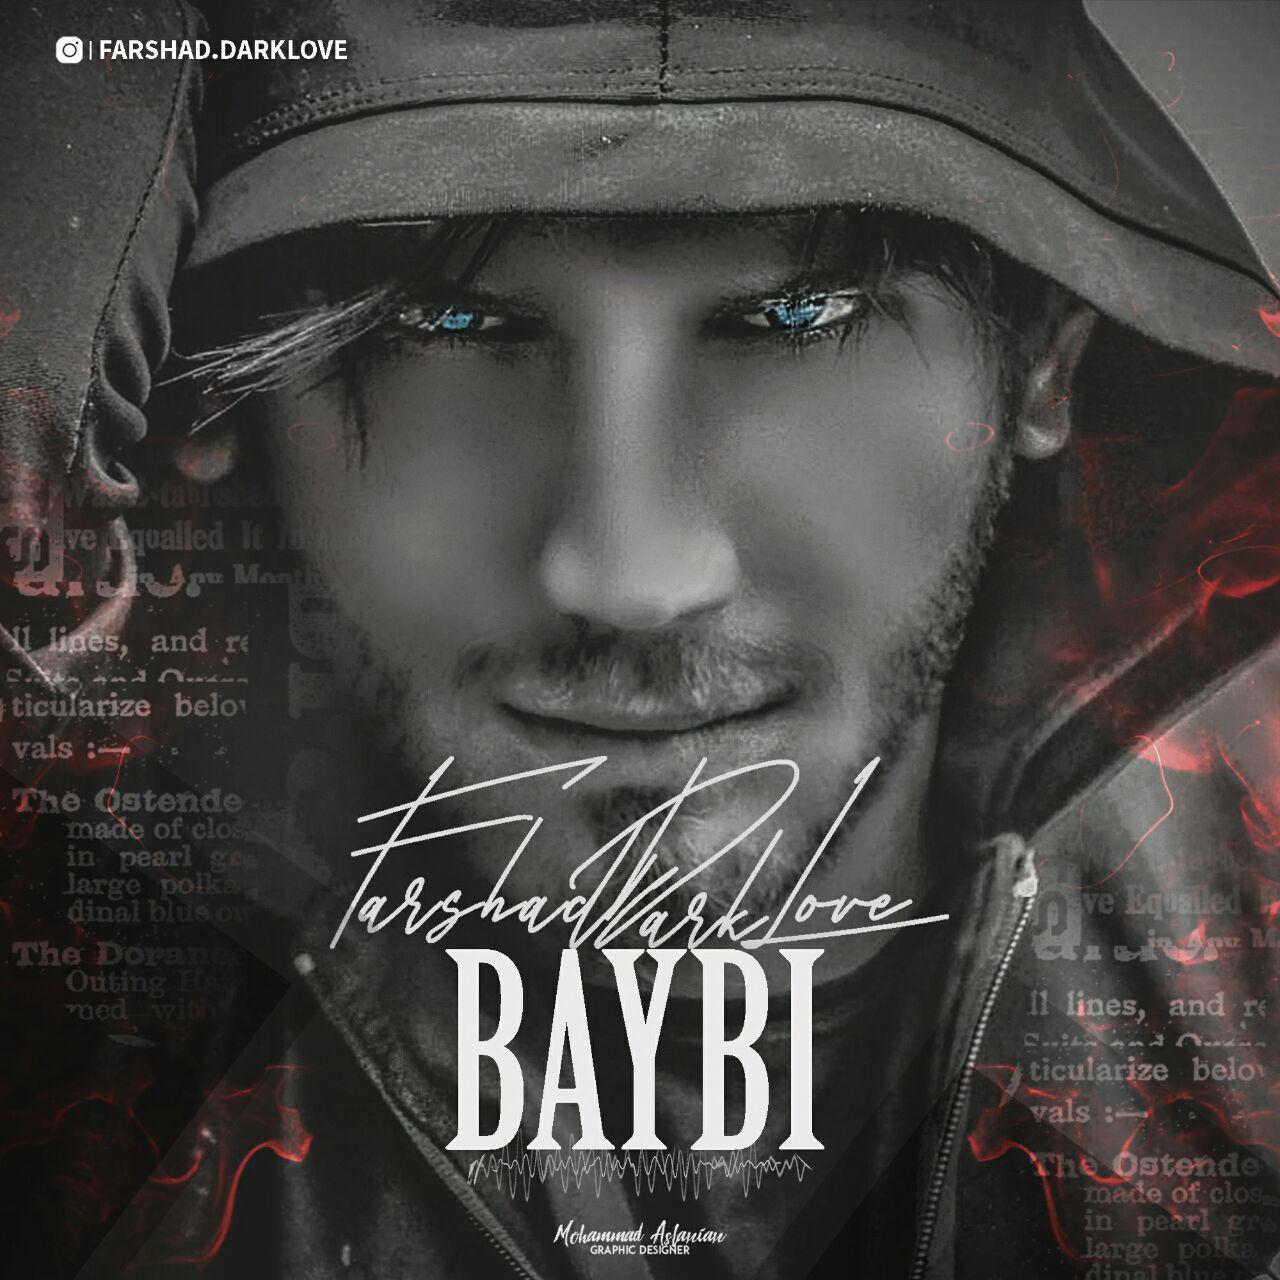 Farshad Dark Love - Baybi Music | آهنگ فرشاد دارک لاو - بی بی